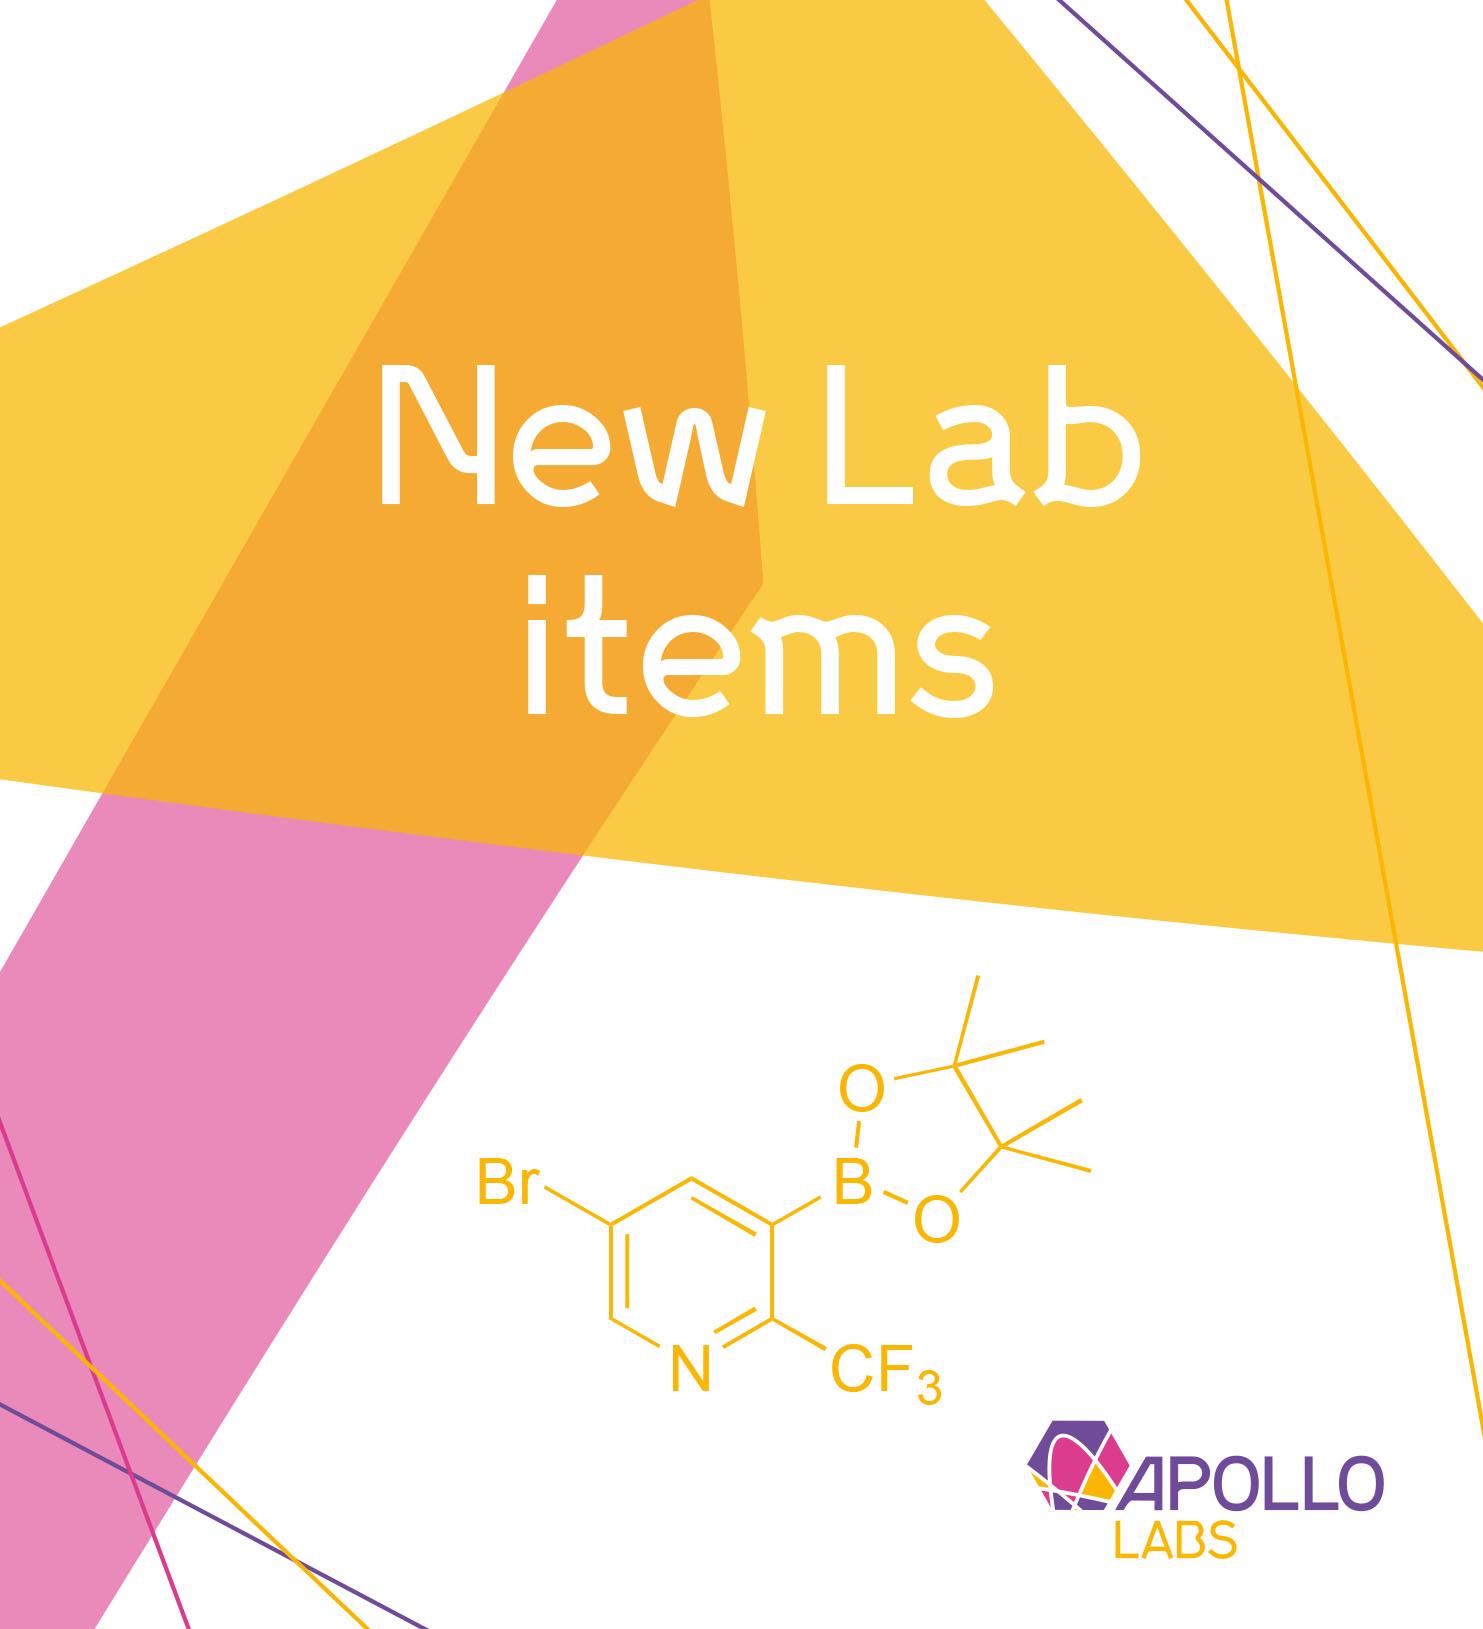 New Lab Items thumbnail image